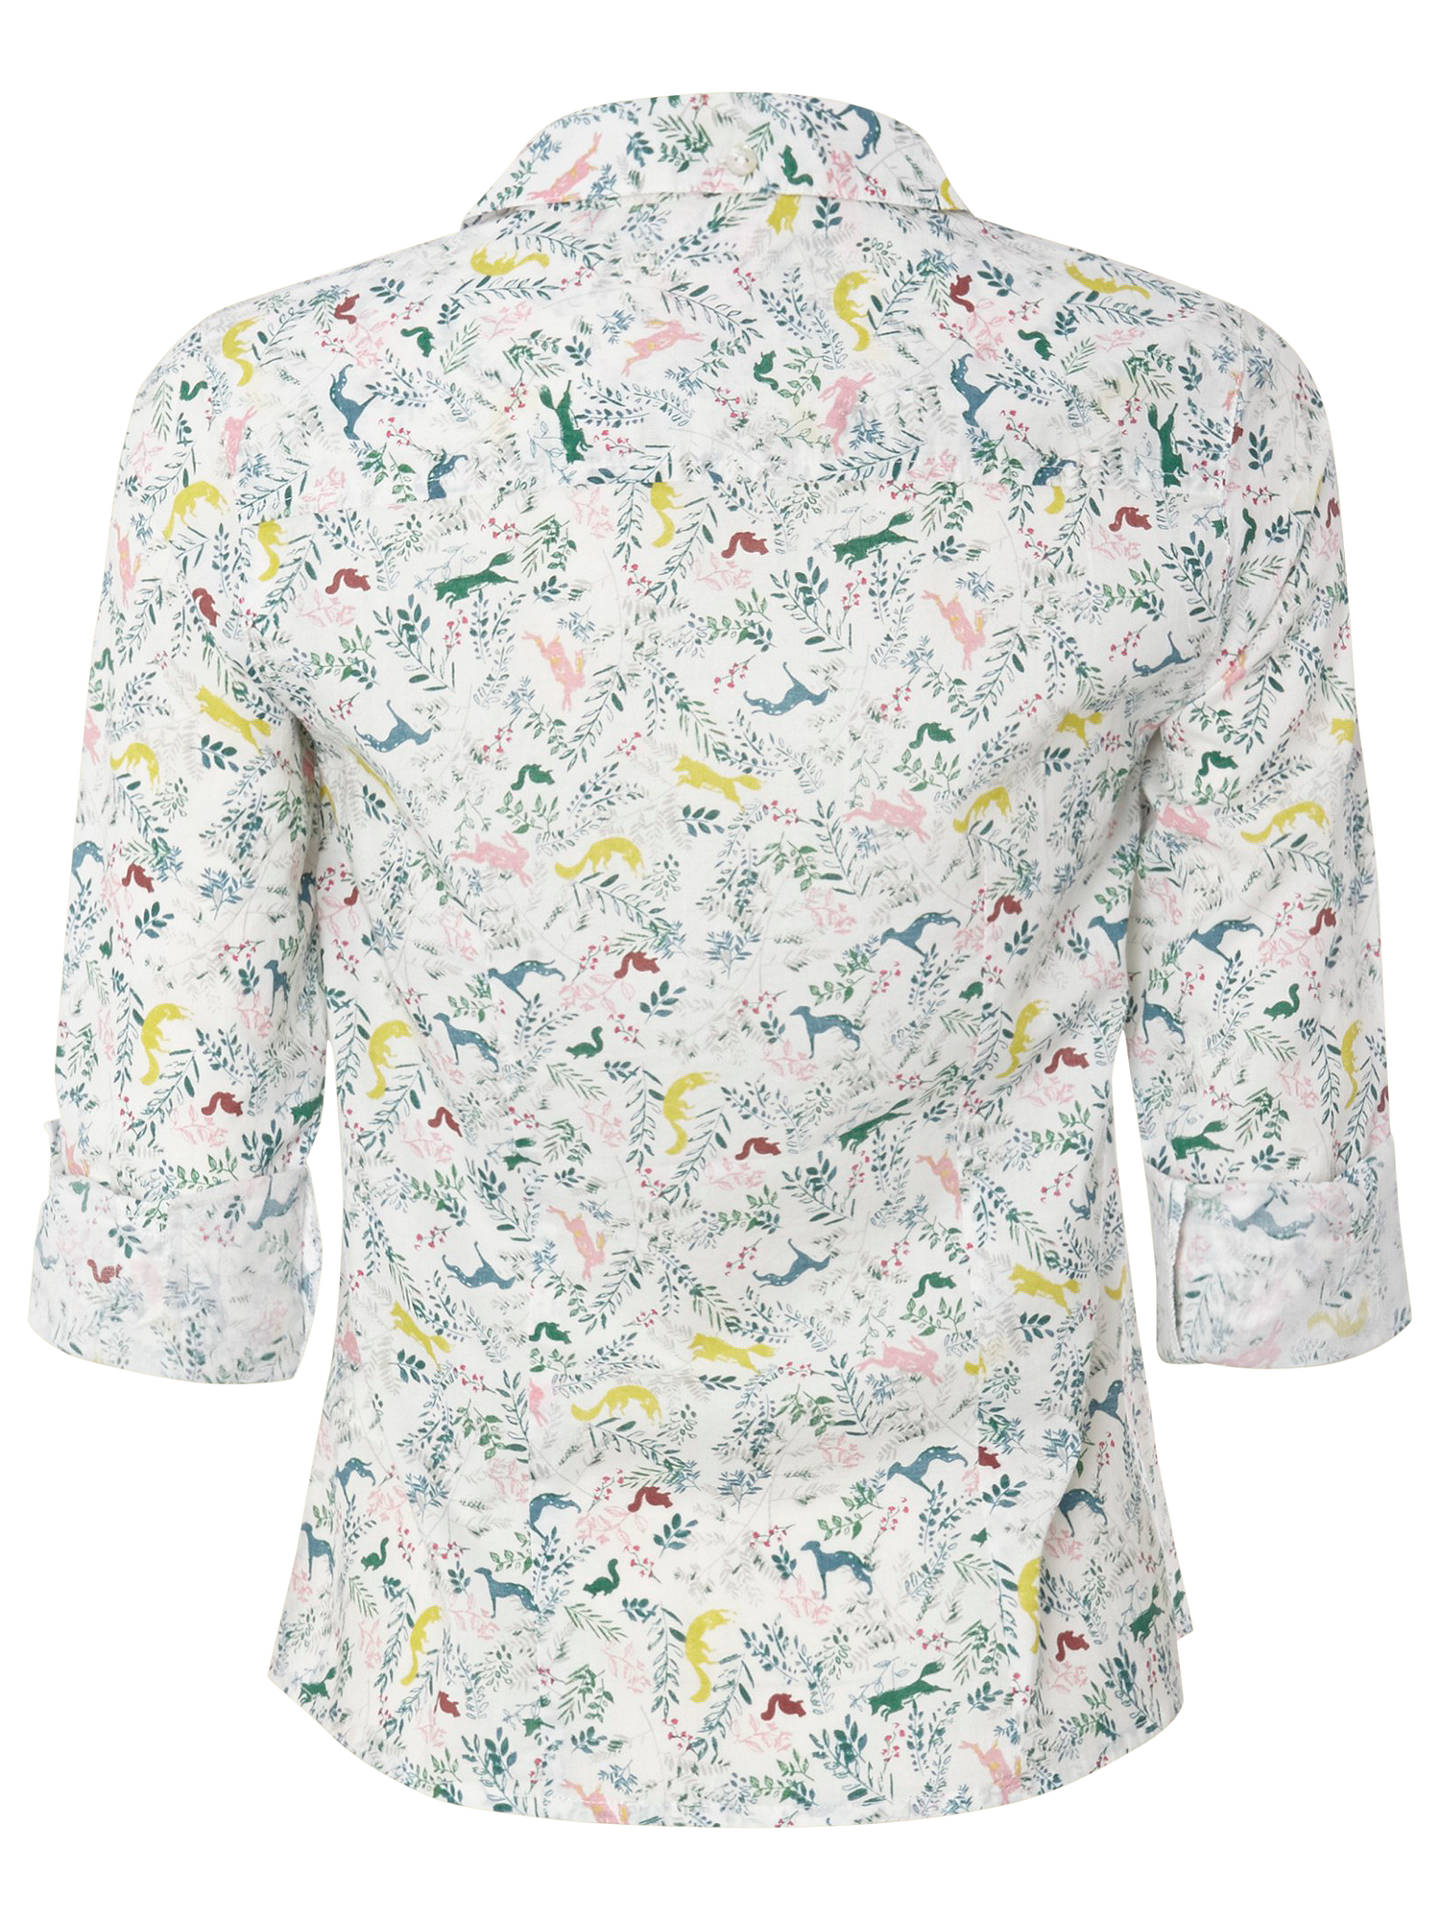 60529af21bfa ... Buy White Stuff Tweedy Shirt, Enamel, 8 Online at johnlewis.com ...